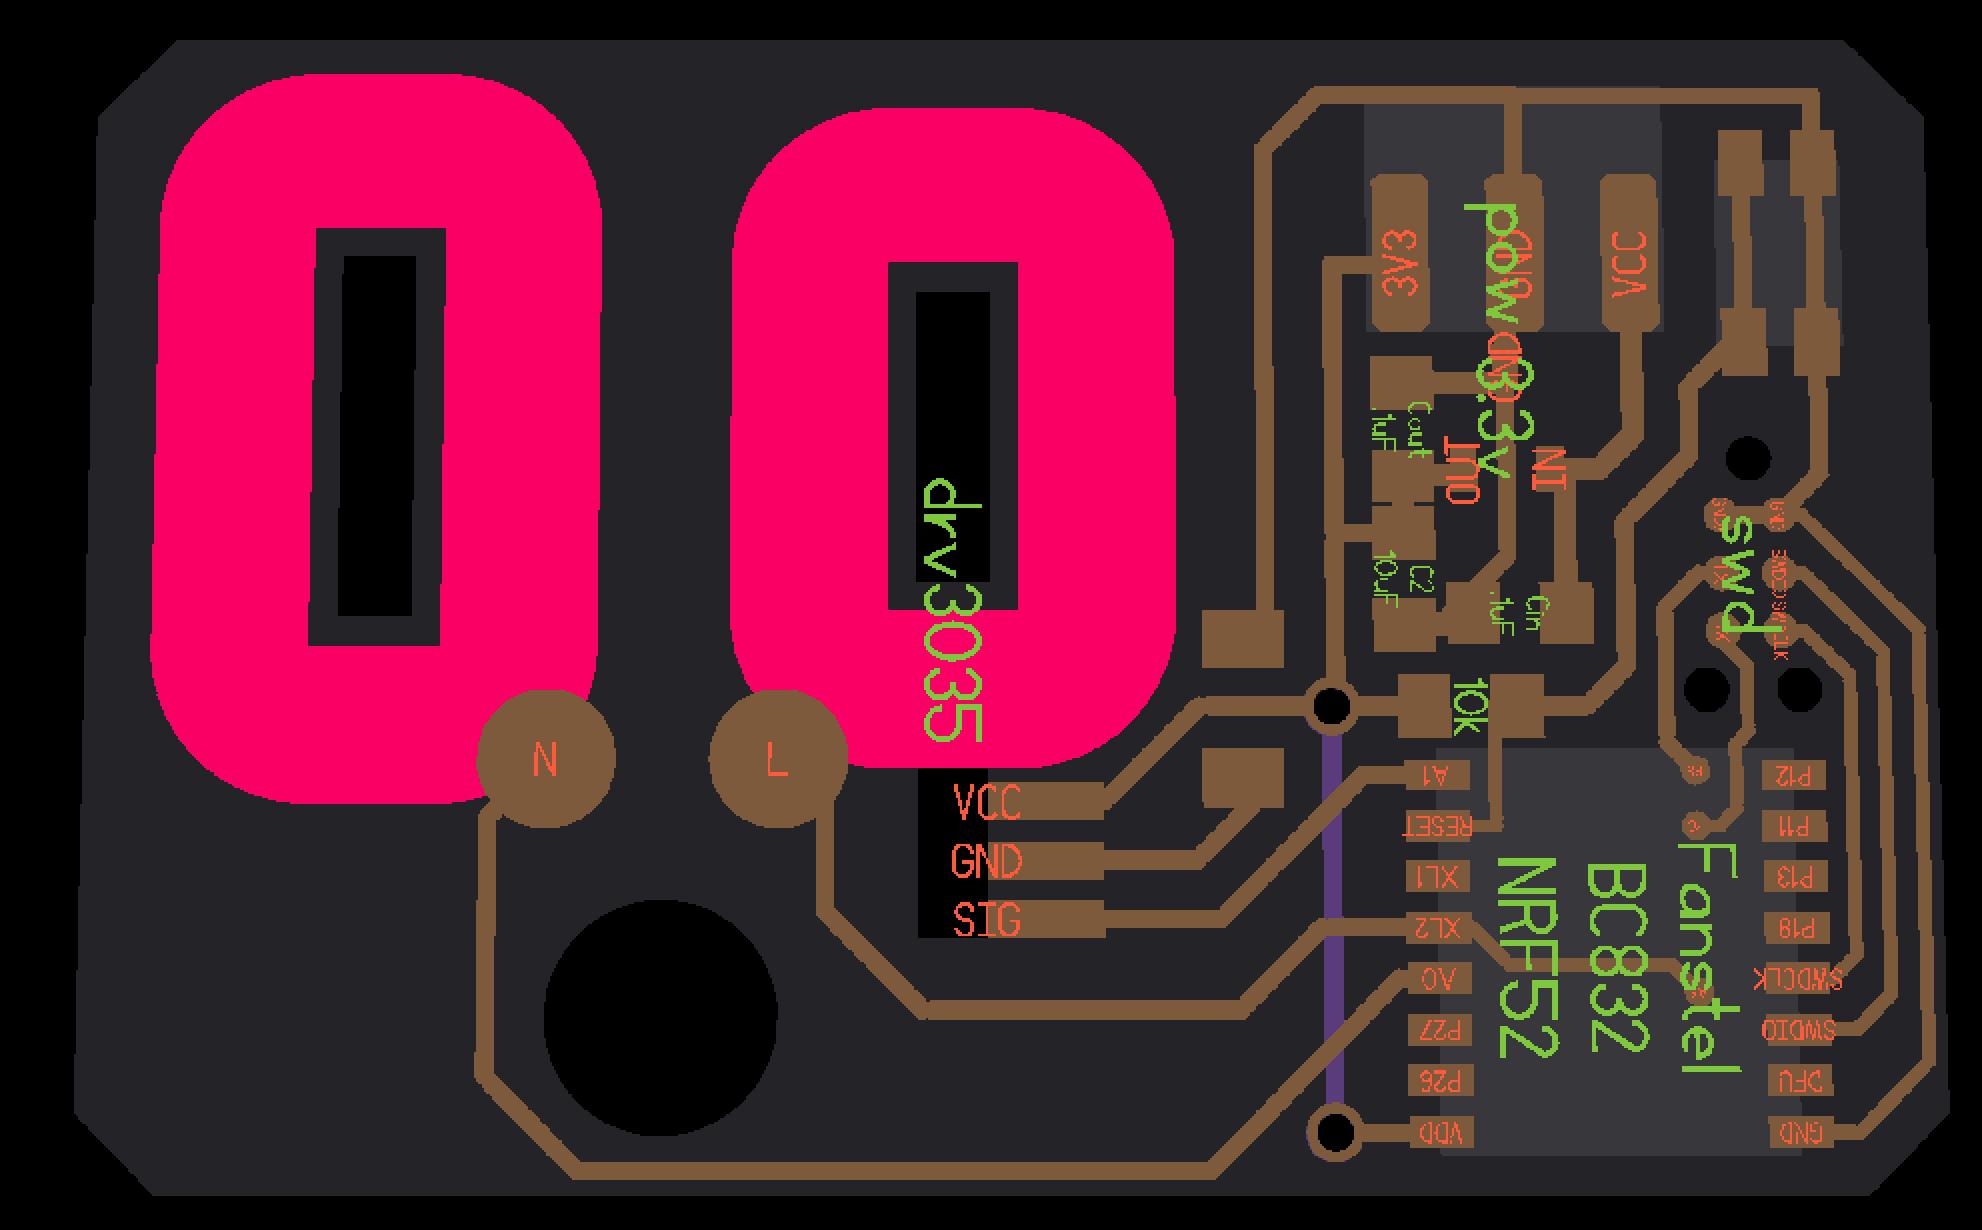 bc832-watt/bc832-watt-layout.png